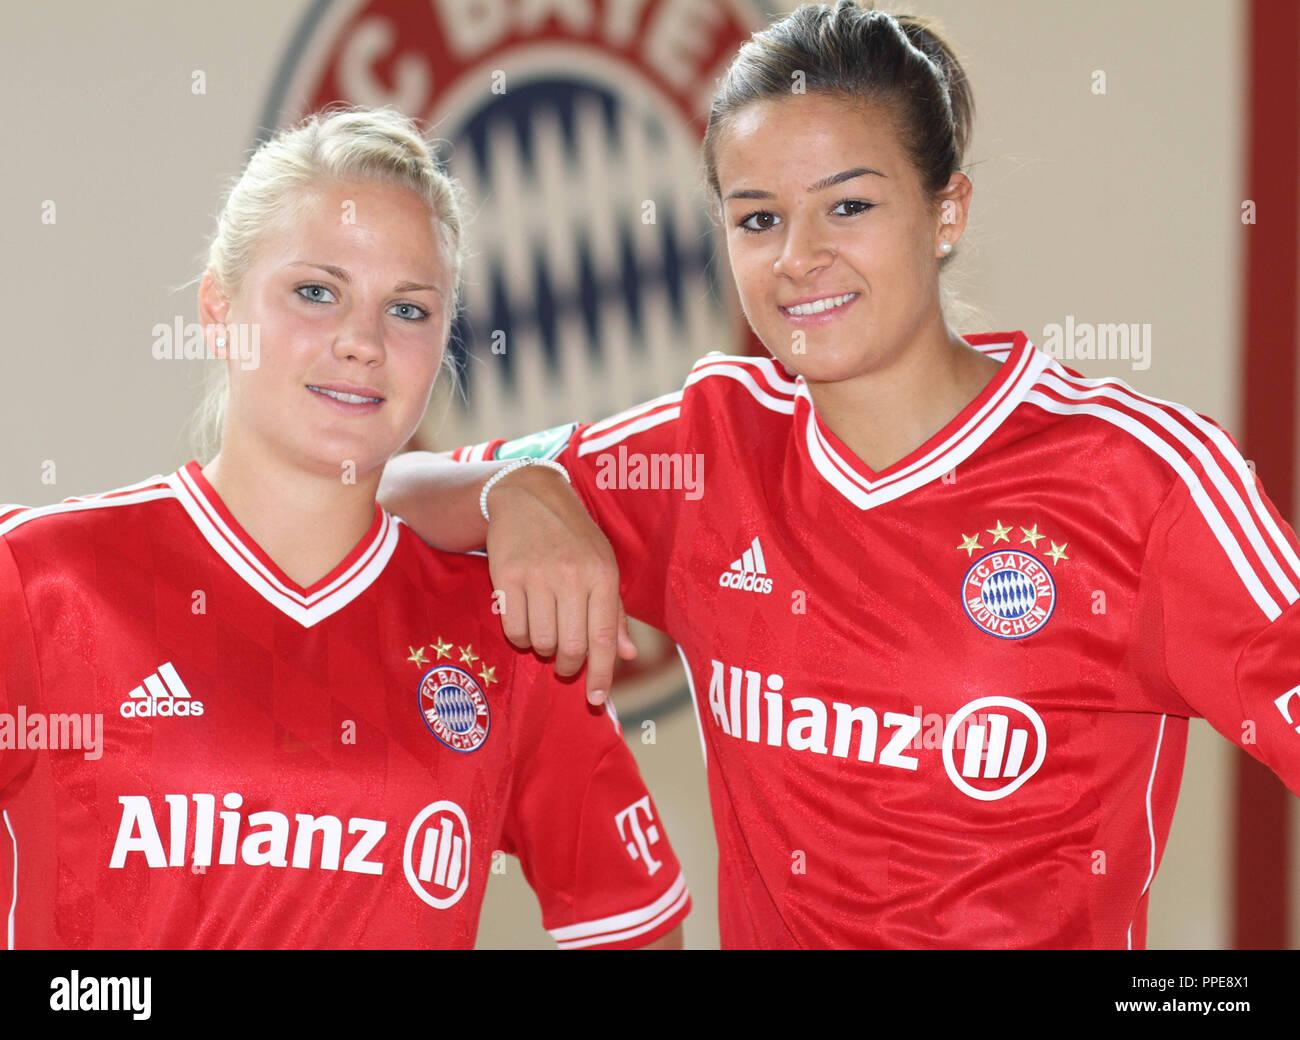 Women's soccer - Bundesliga 1 2013/2014: The national players Leonie Maier and Lena Lotzen from FC Bayern Munich. - Stock Image